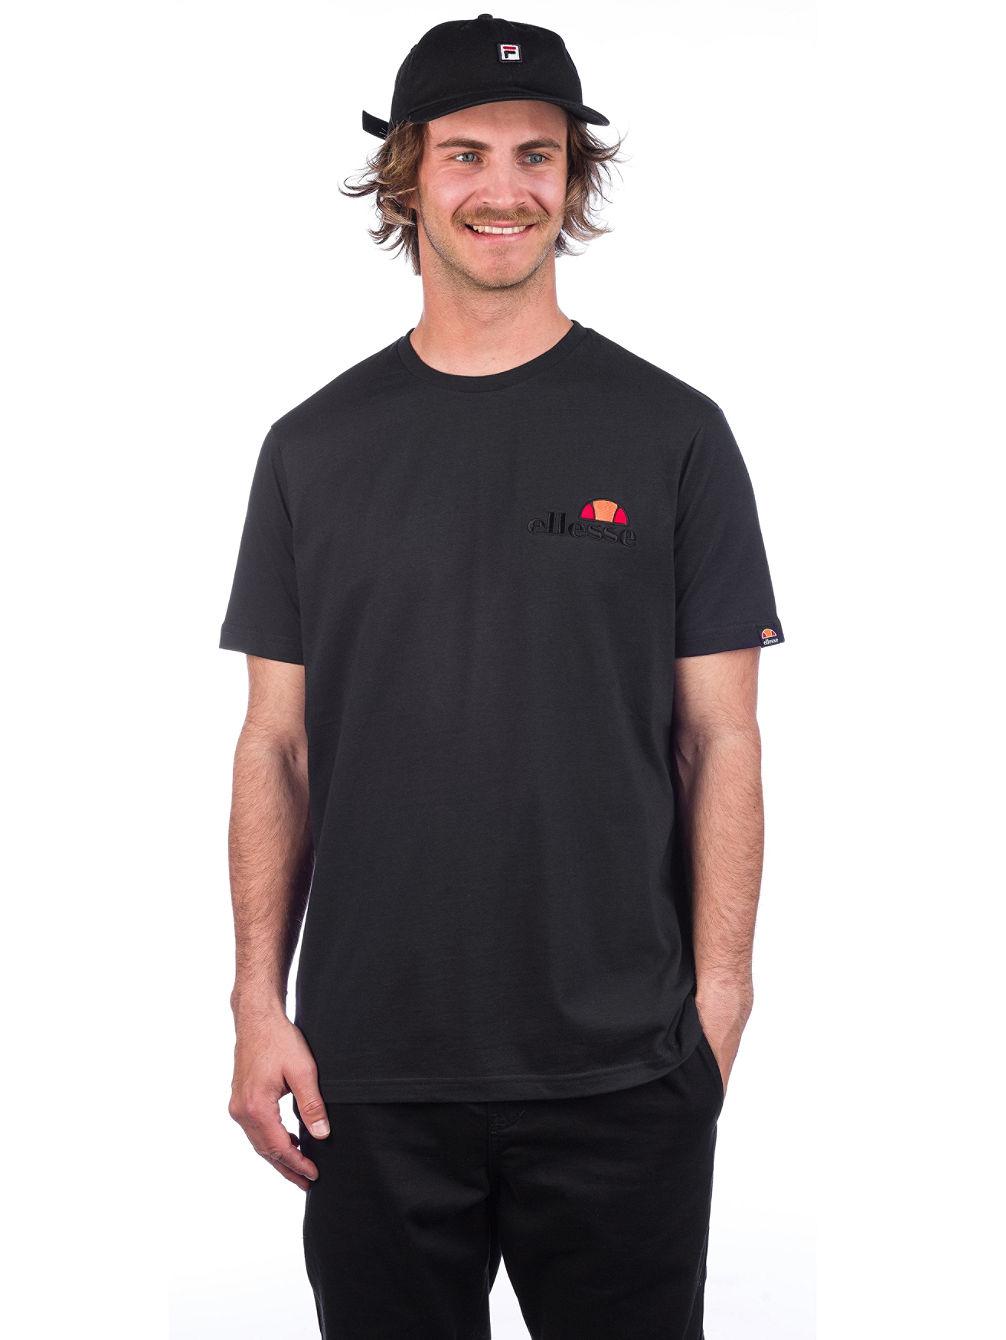 0cc8e727 Buy Ellesse Voodoo T-Shirt online at Blue Tomato